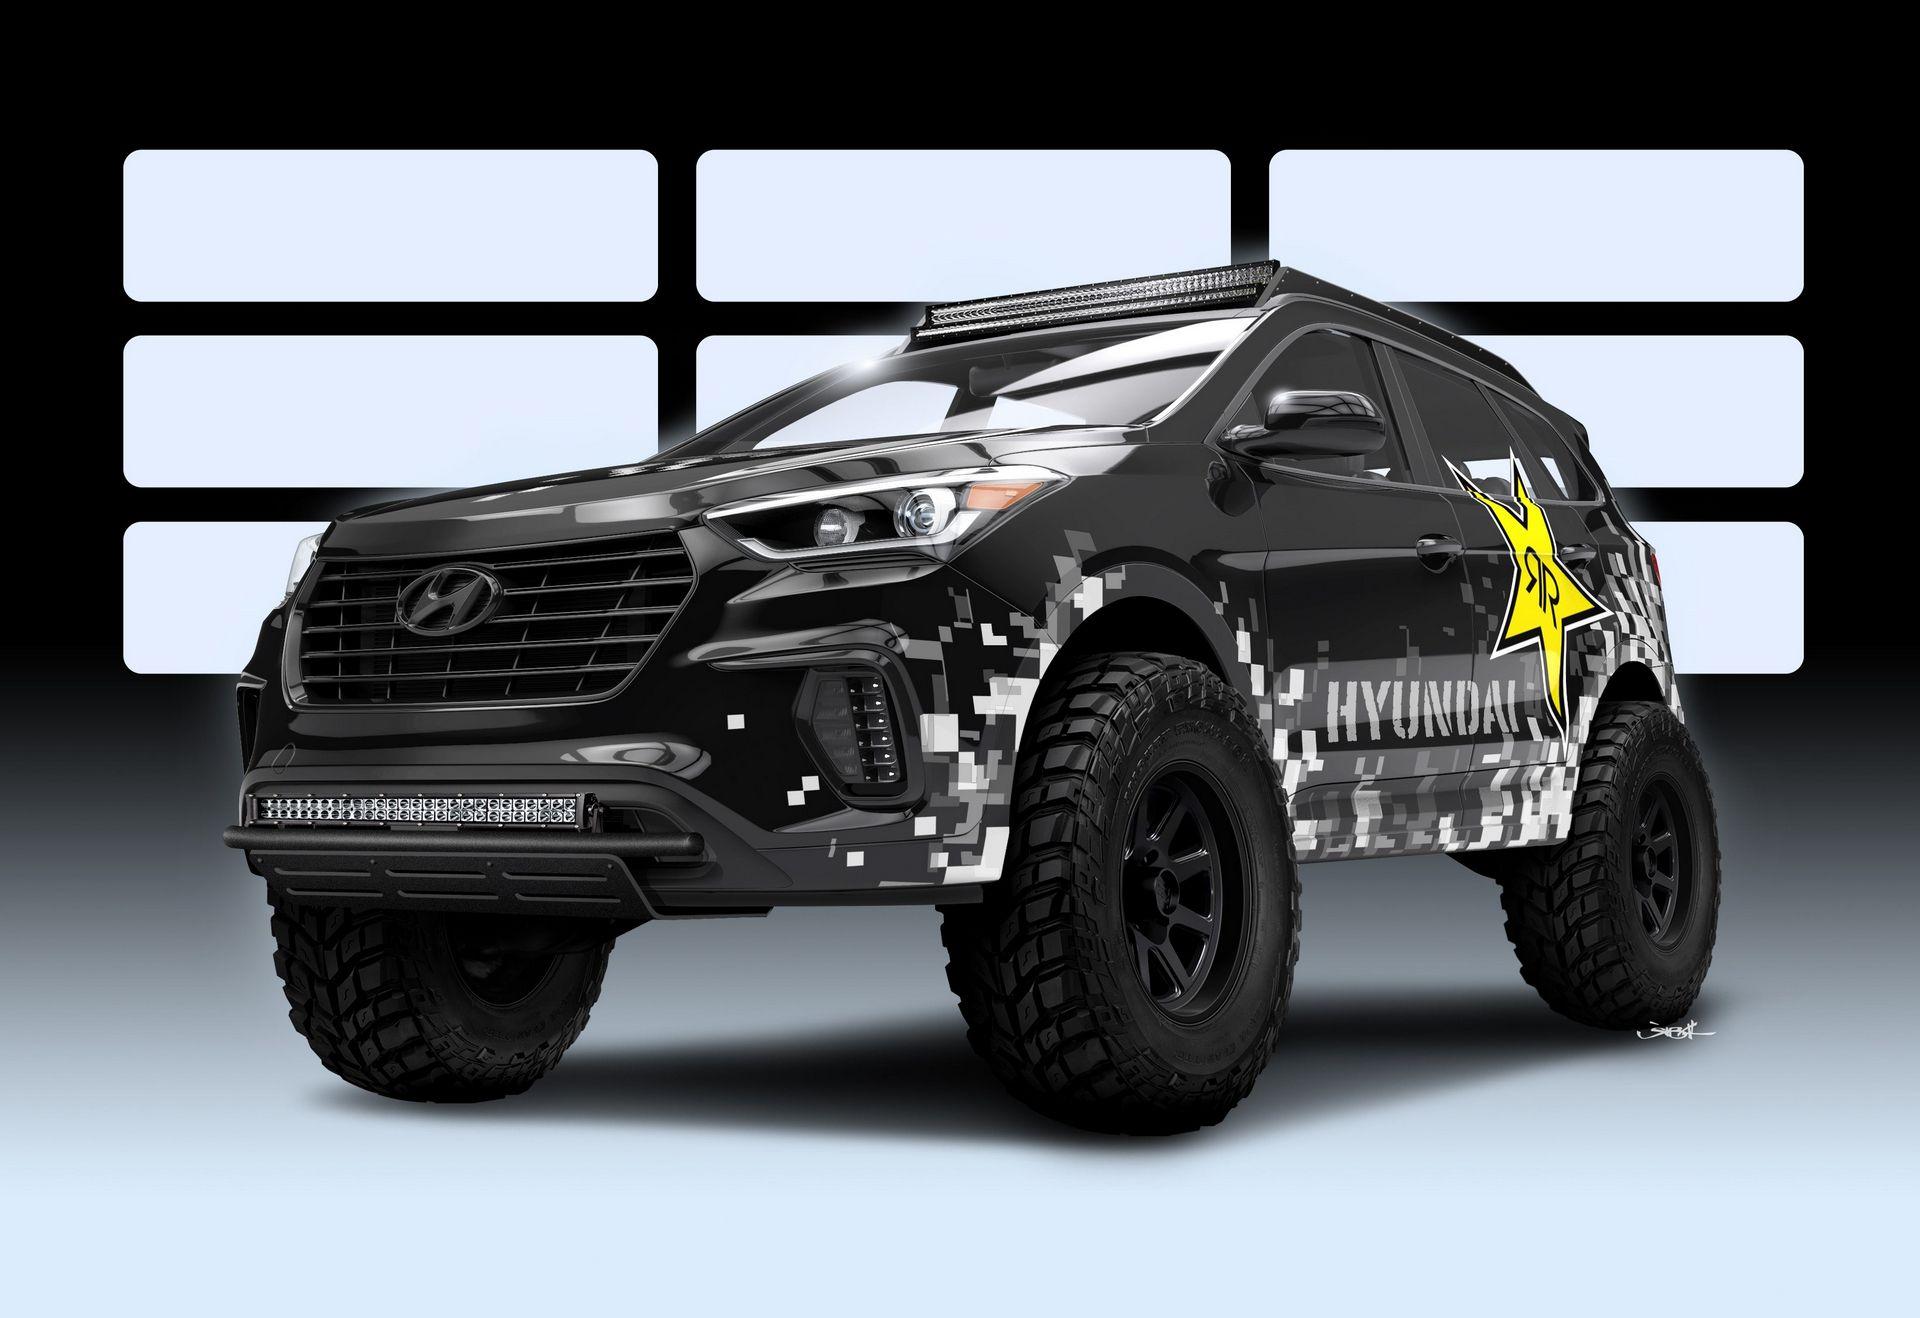 Hyundai Motor America And Rockstar Performance Garage Have Partnered To Develop A Nitrous Powered Santa Fe Cuv Capable Of Ser Hyundai Santa Fe Hyundai Santa Fe